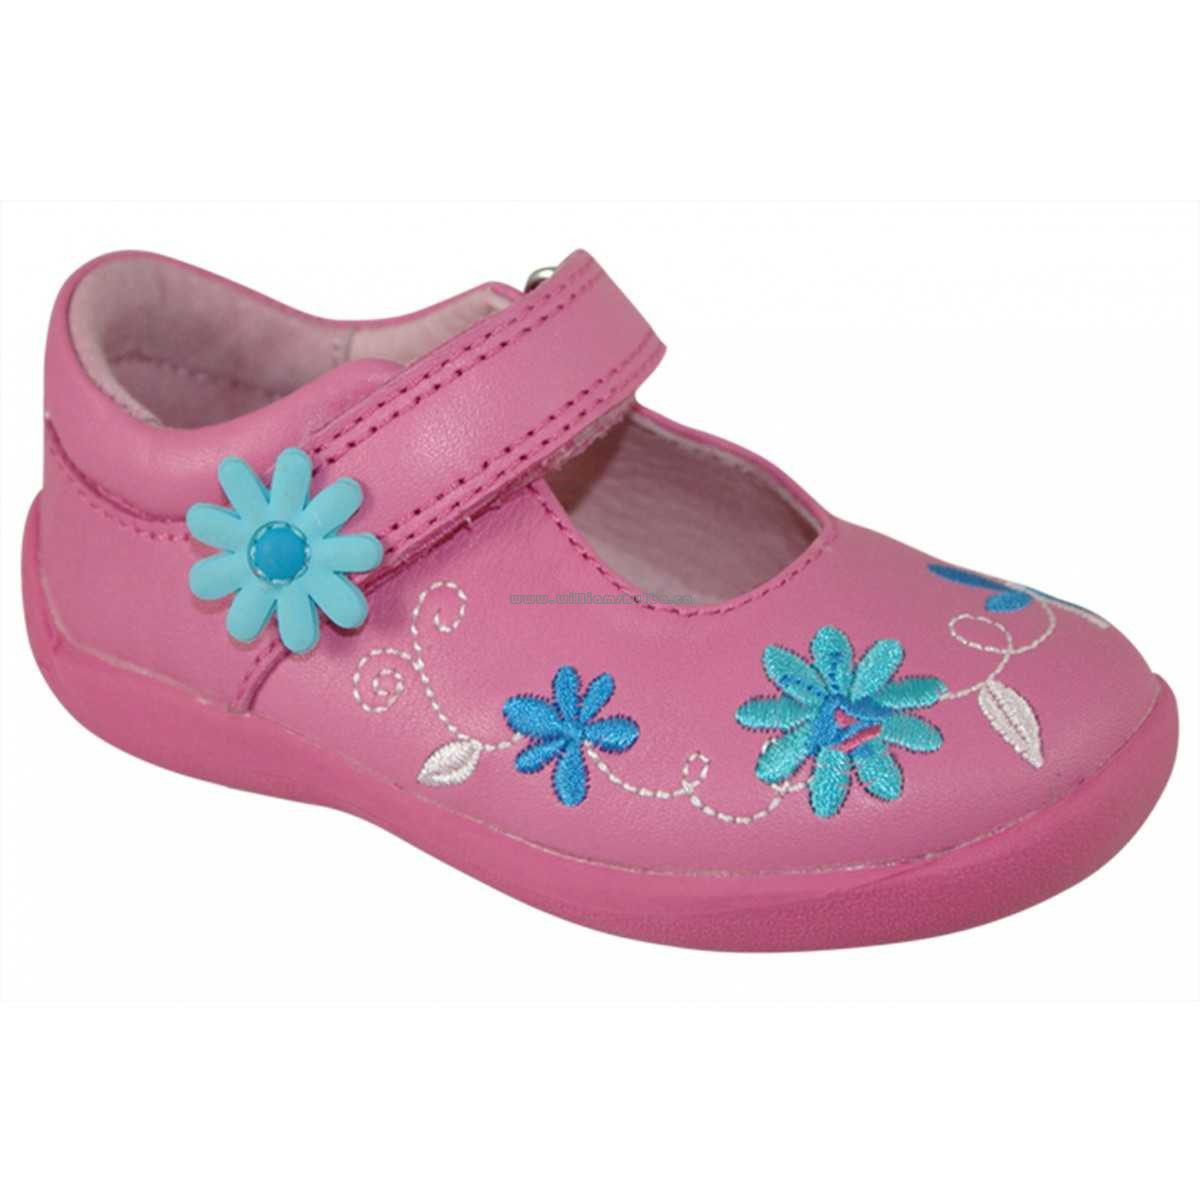 2b57faccac0c00 Дитячі туфлі(мокасіни,босоніжки,балетки)Kids Start-Rite Honeybee Розмір (